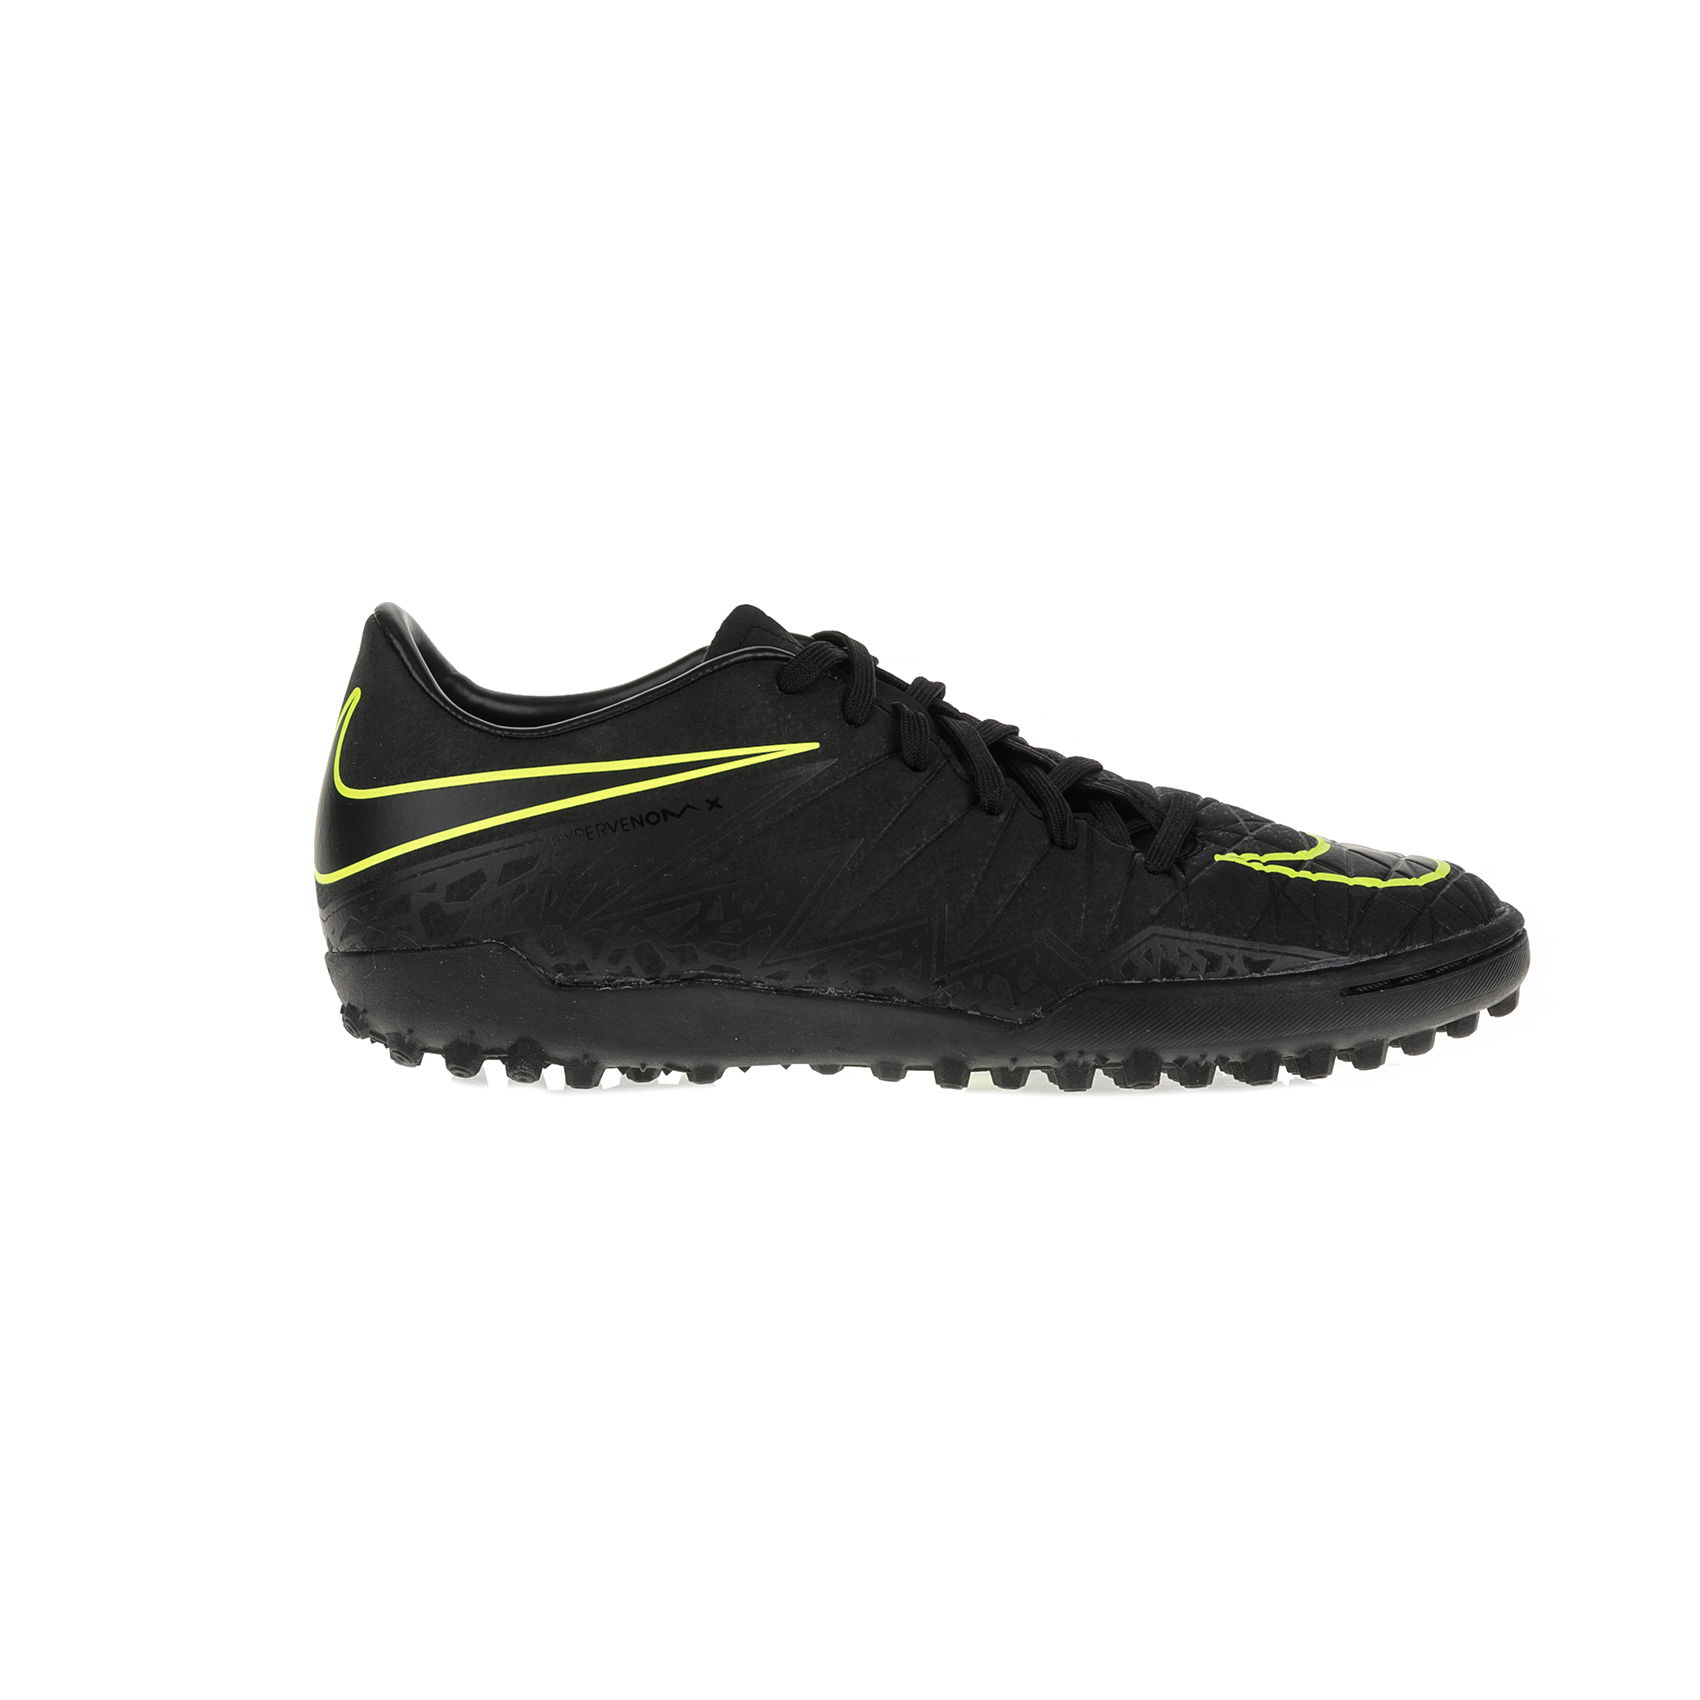 NIKE - Αθλητικά παπούτσια NIKE HYPERVENOM PHELON II FG μαύρα ανδρικά παπούτσια αθλητικά football